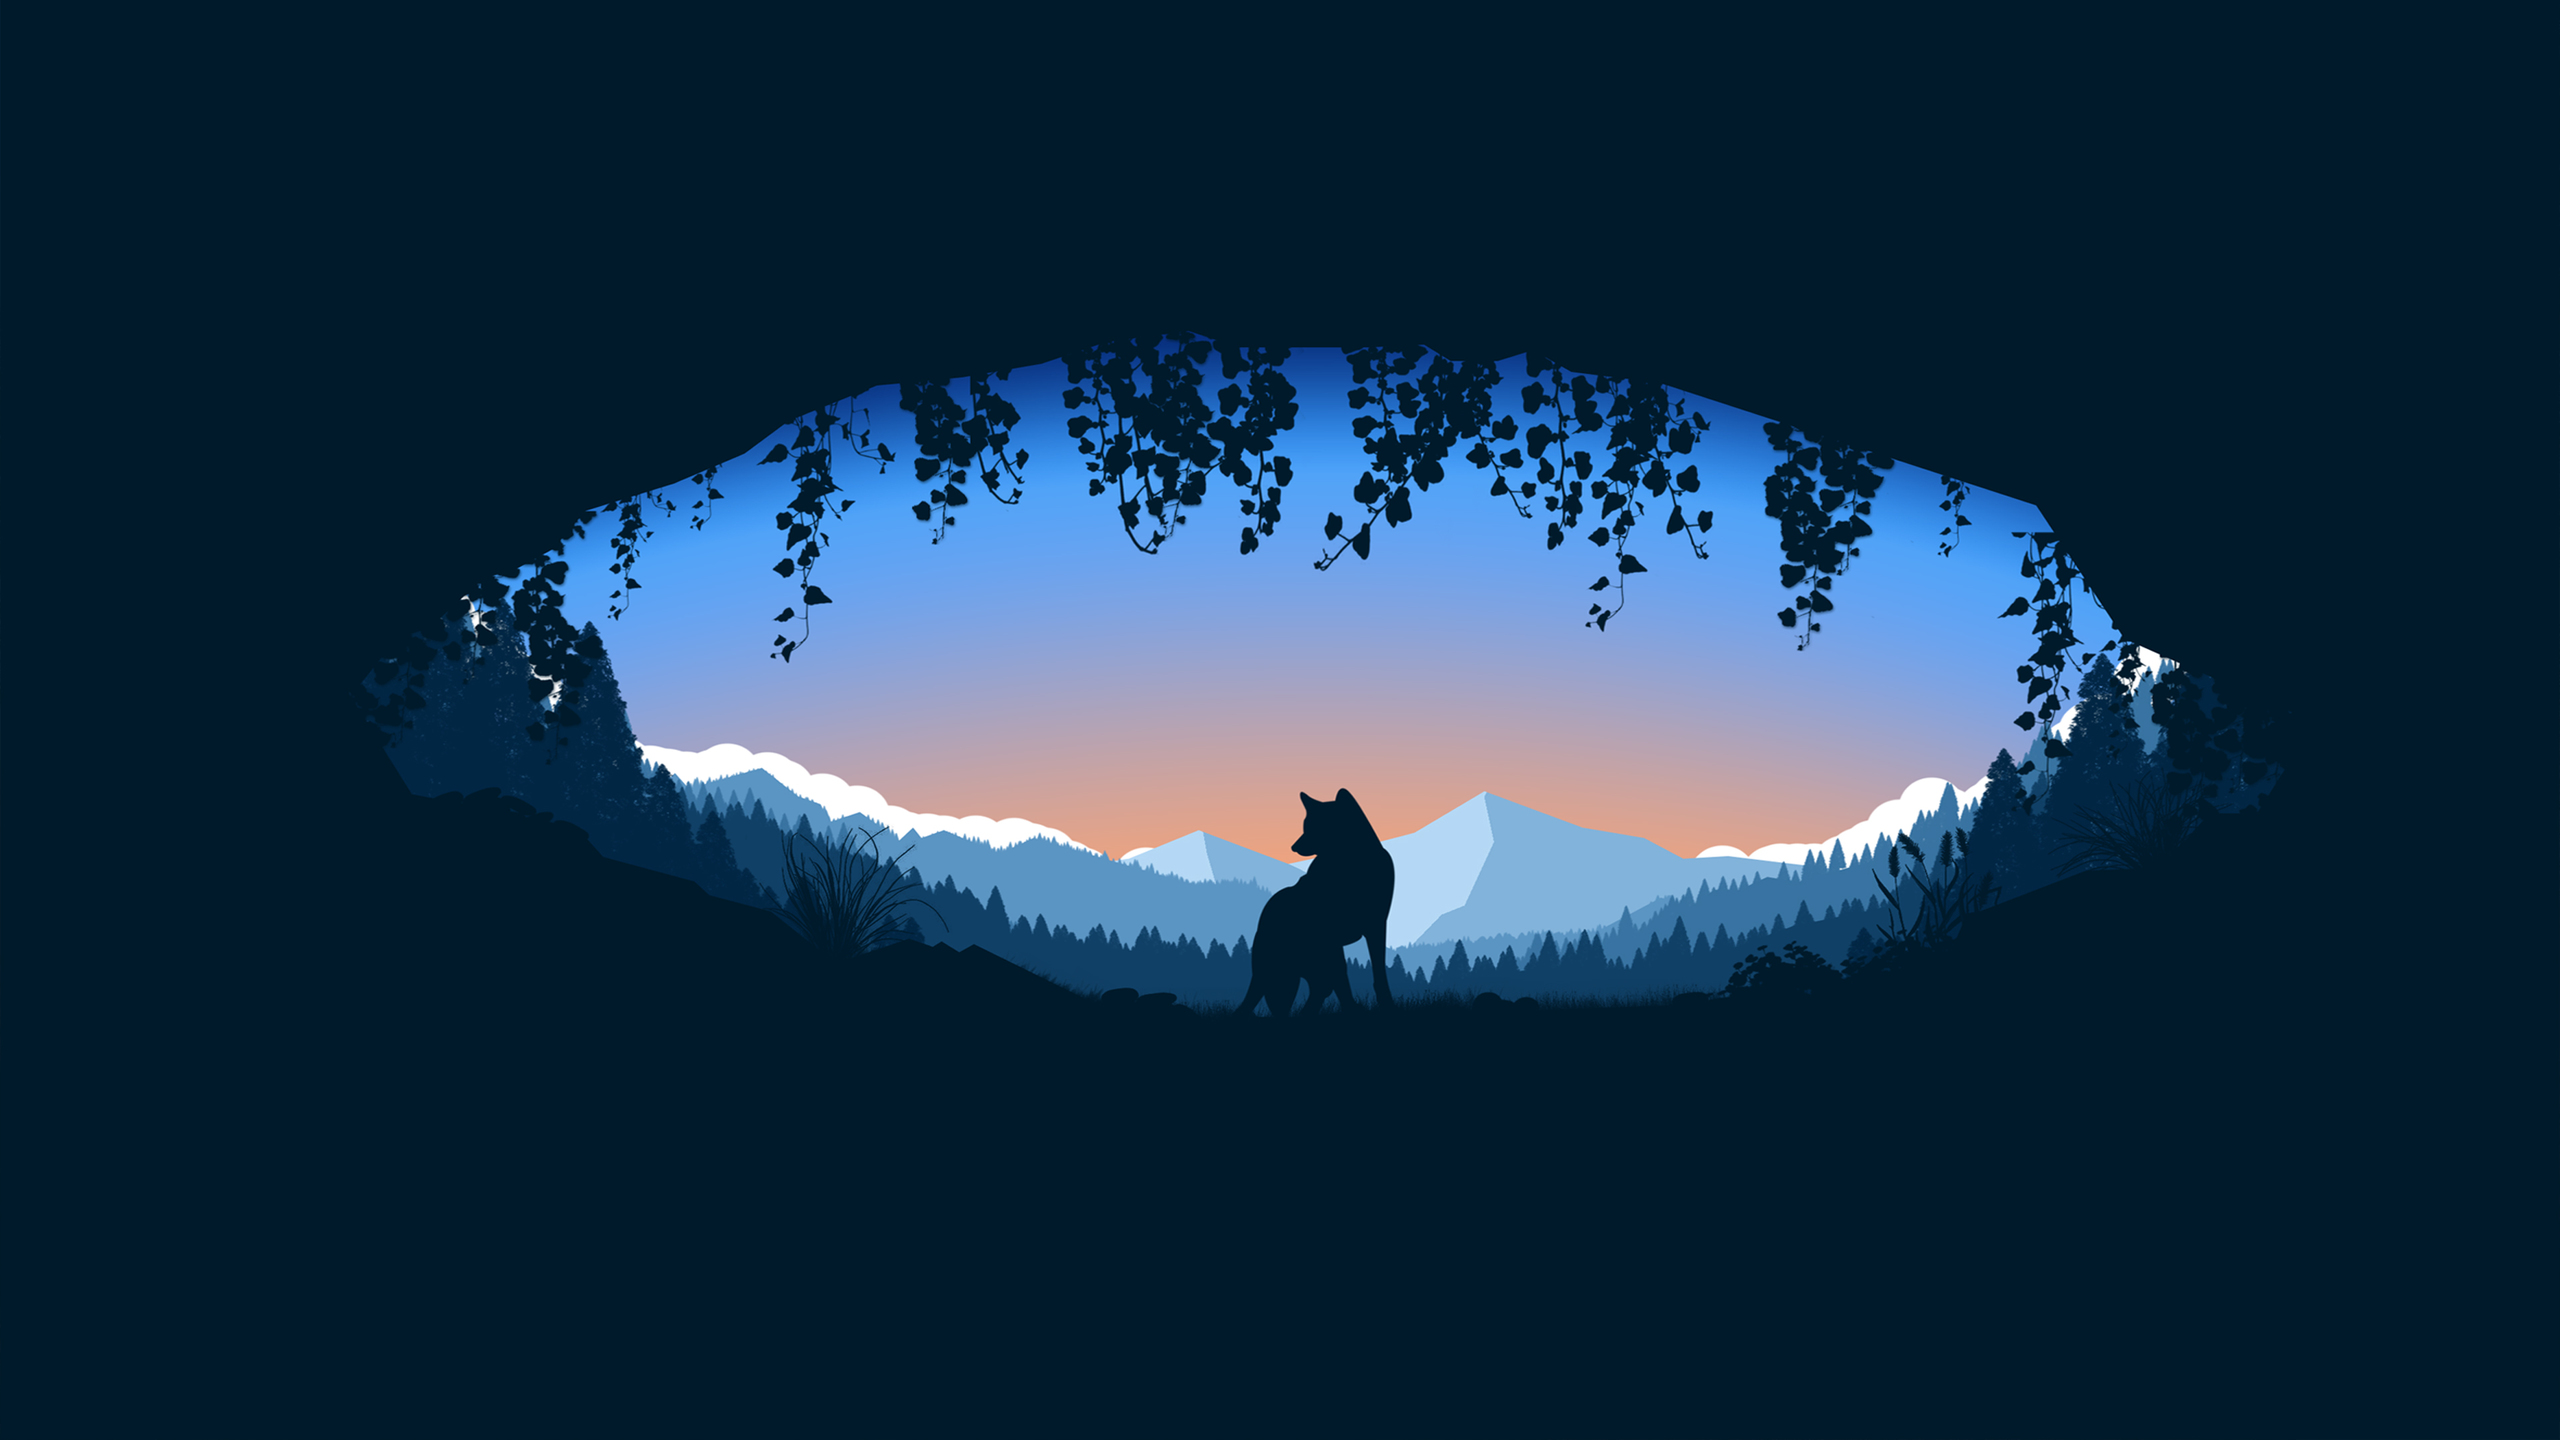 General 2560x1440 digital art fox landscape nature fantasy art minimalism artwork animals plants dark